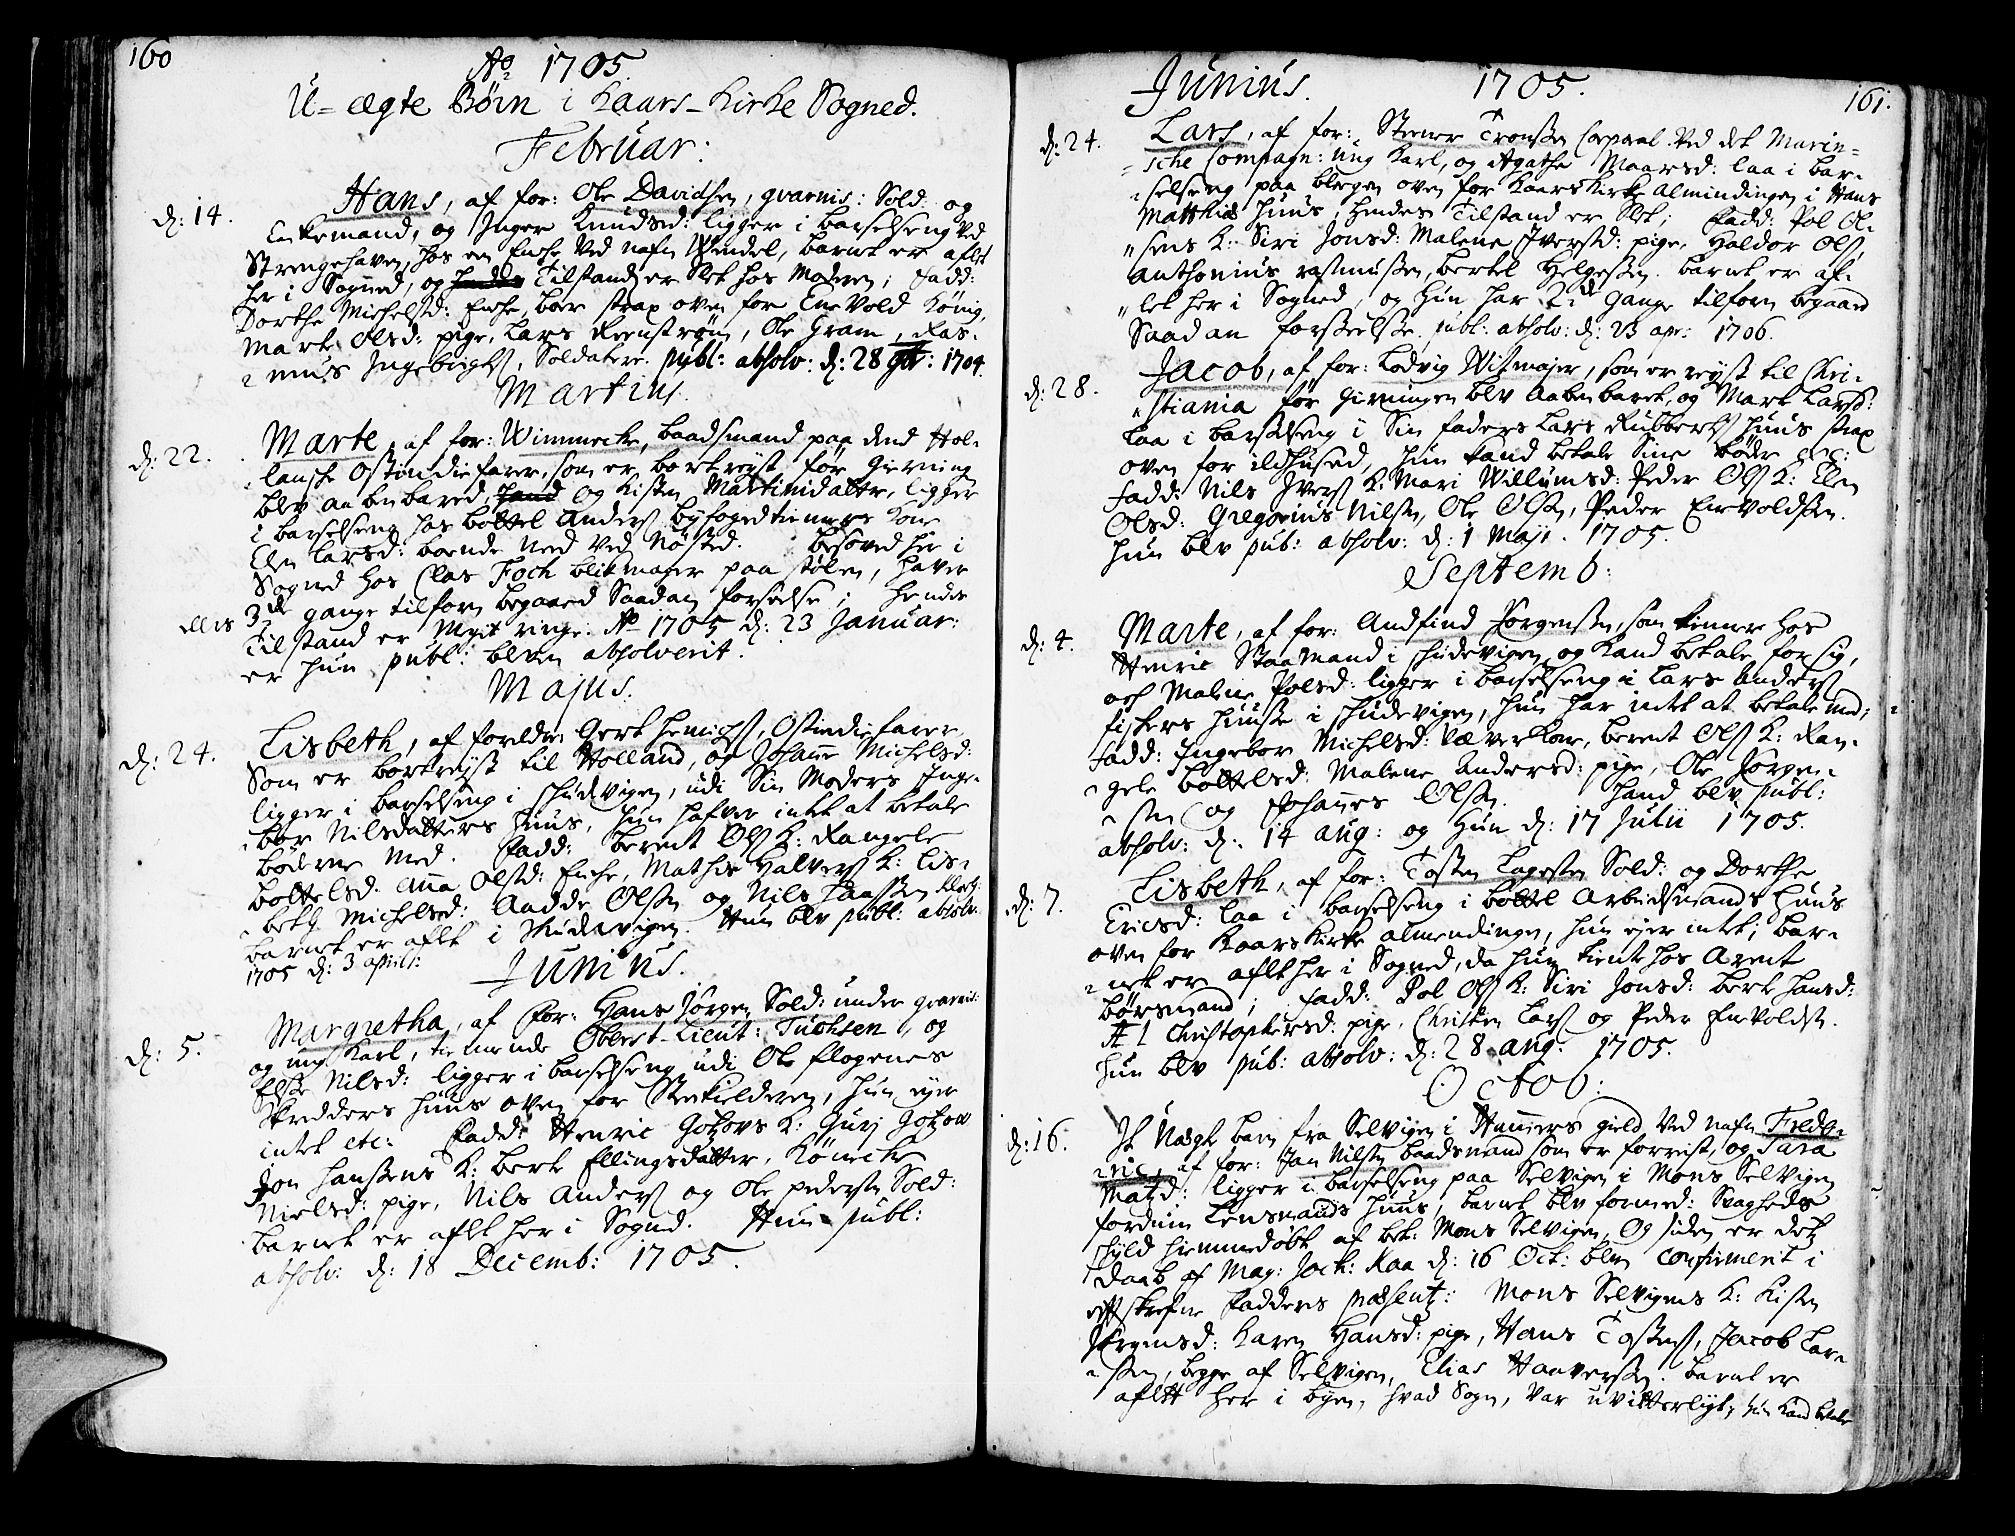 SAB, Korskirken Sokneprestembete, H/Haa/L0003: Ministerialbok nr. A 3, 1698-1719, s. 160-161